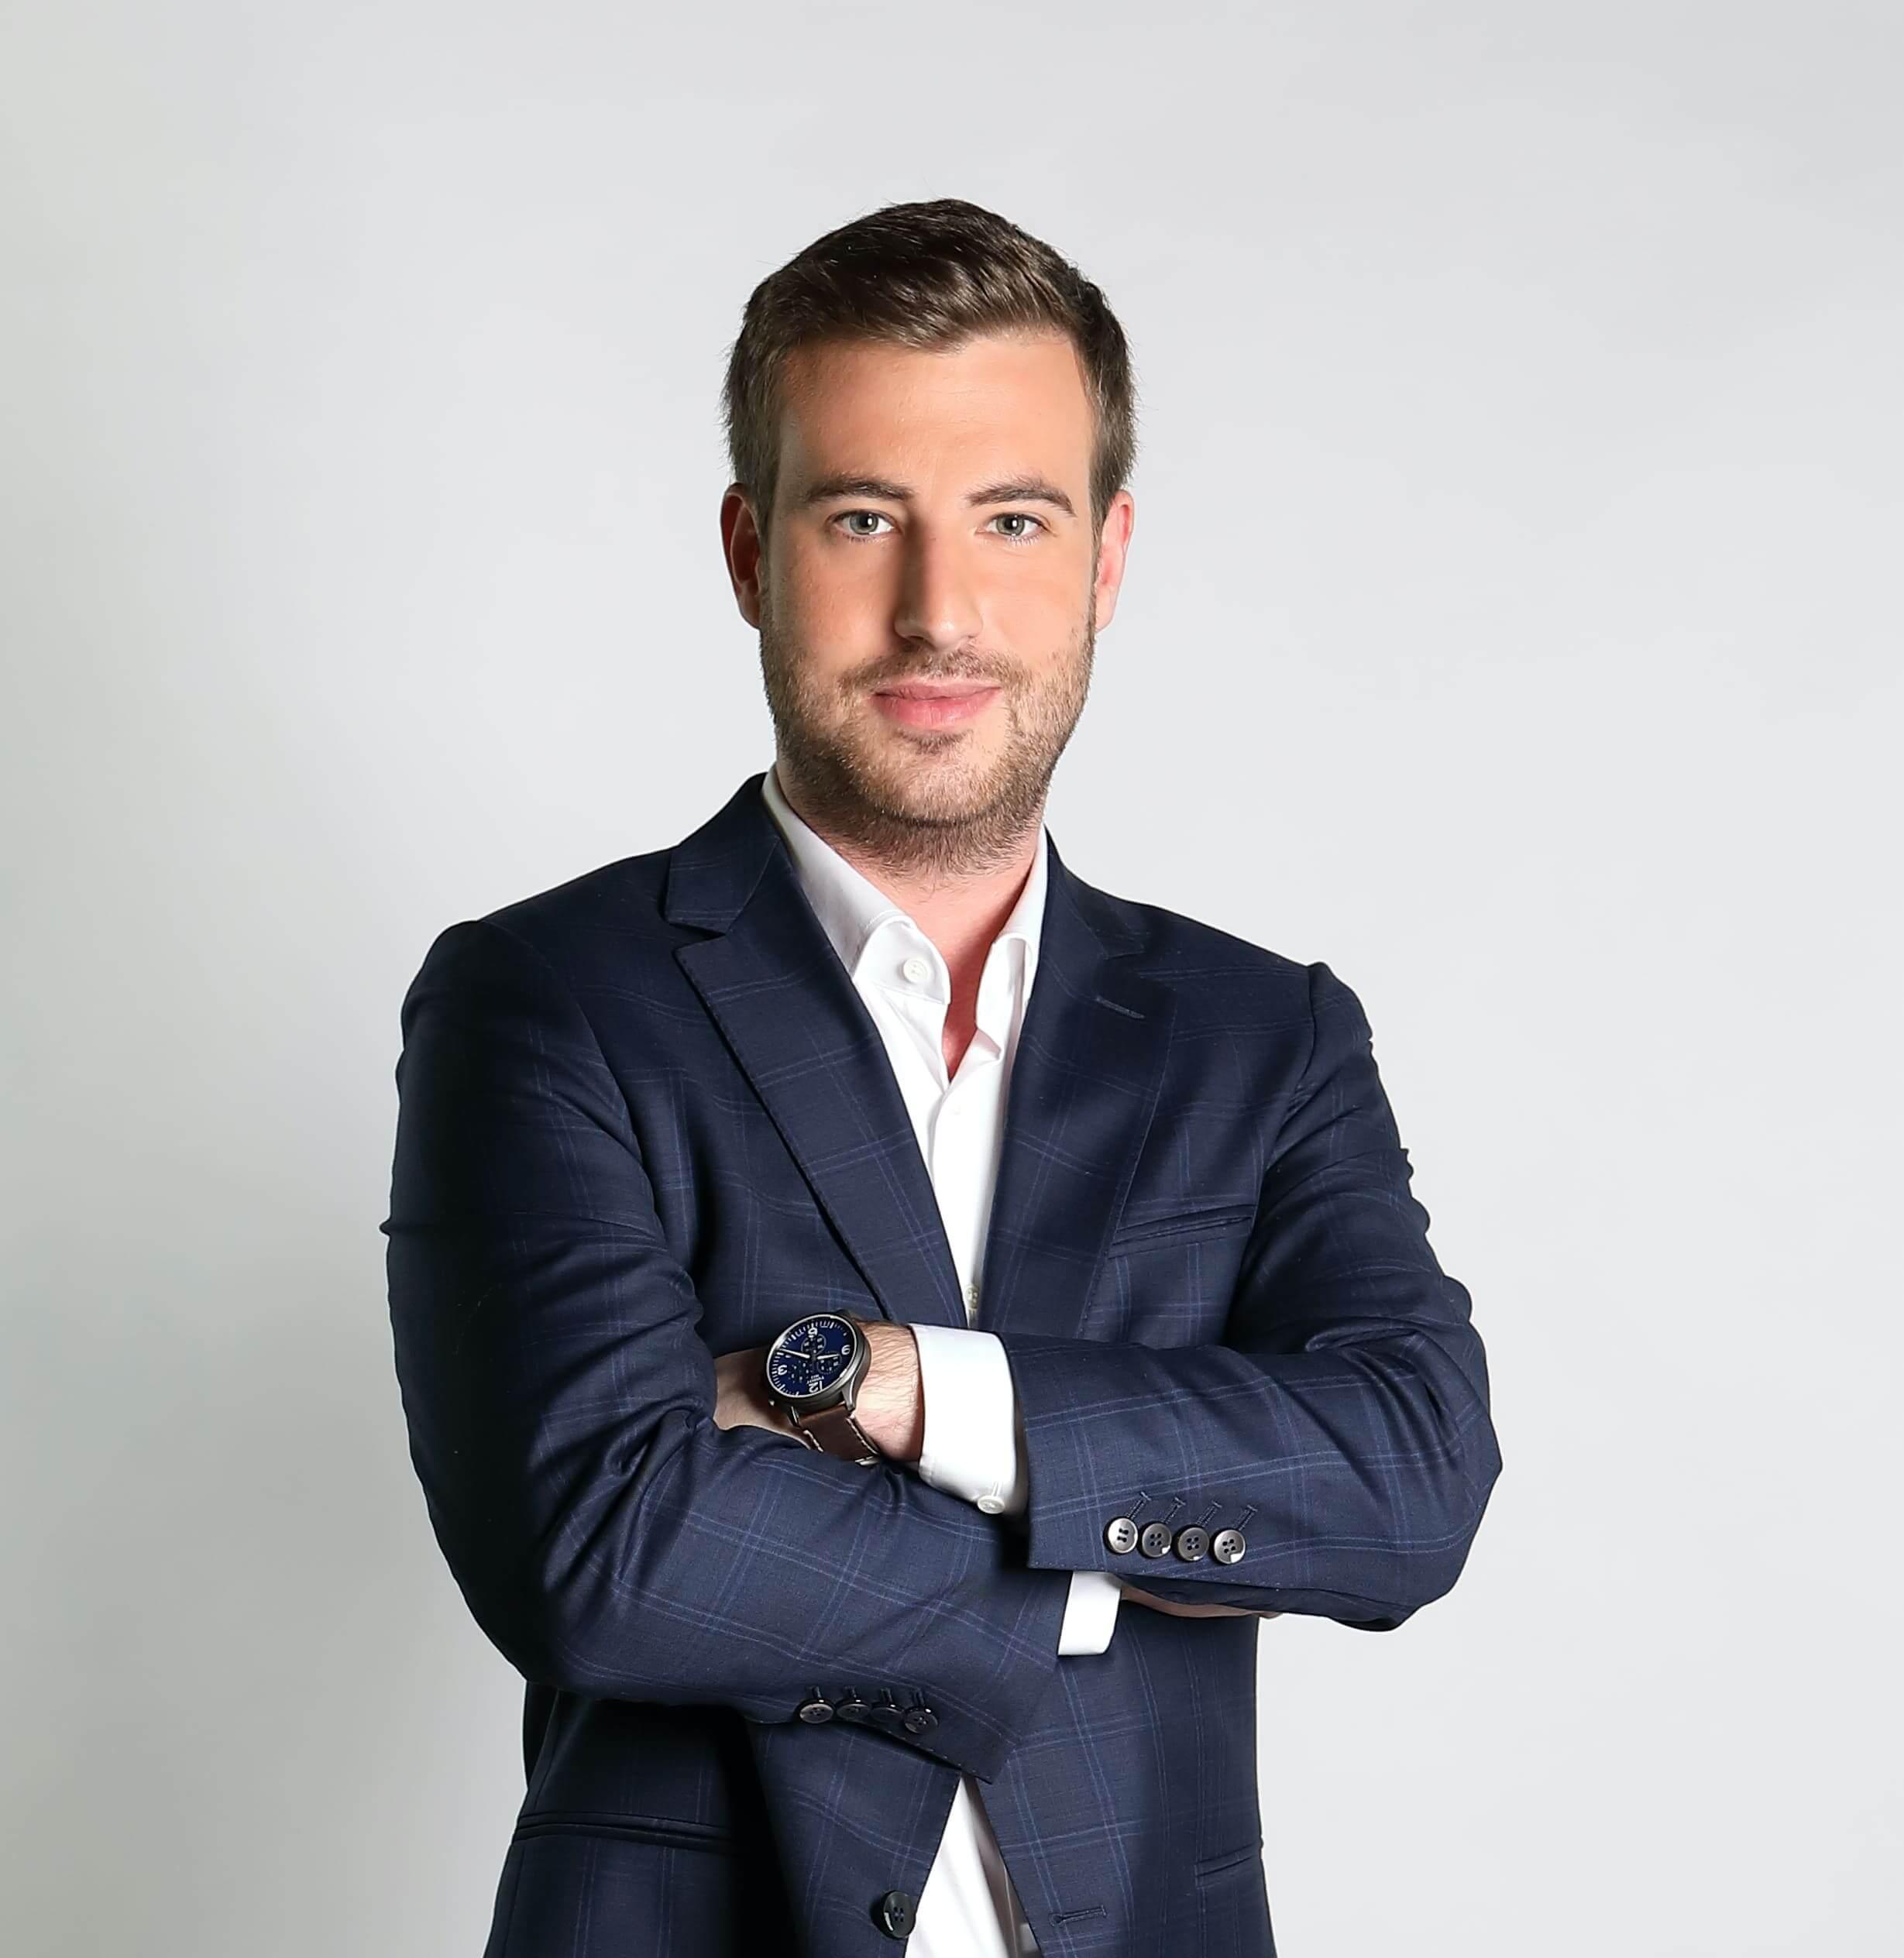 Marco Ostwald Moderation